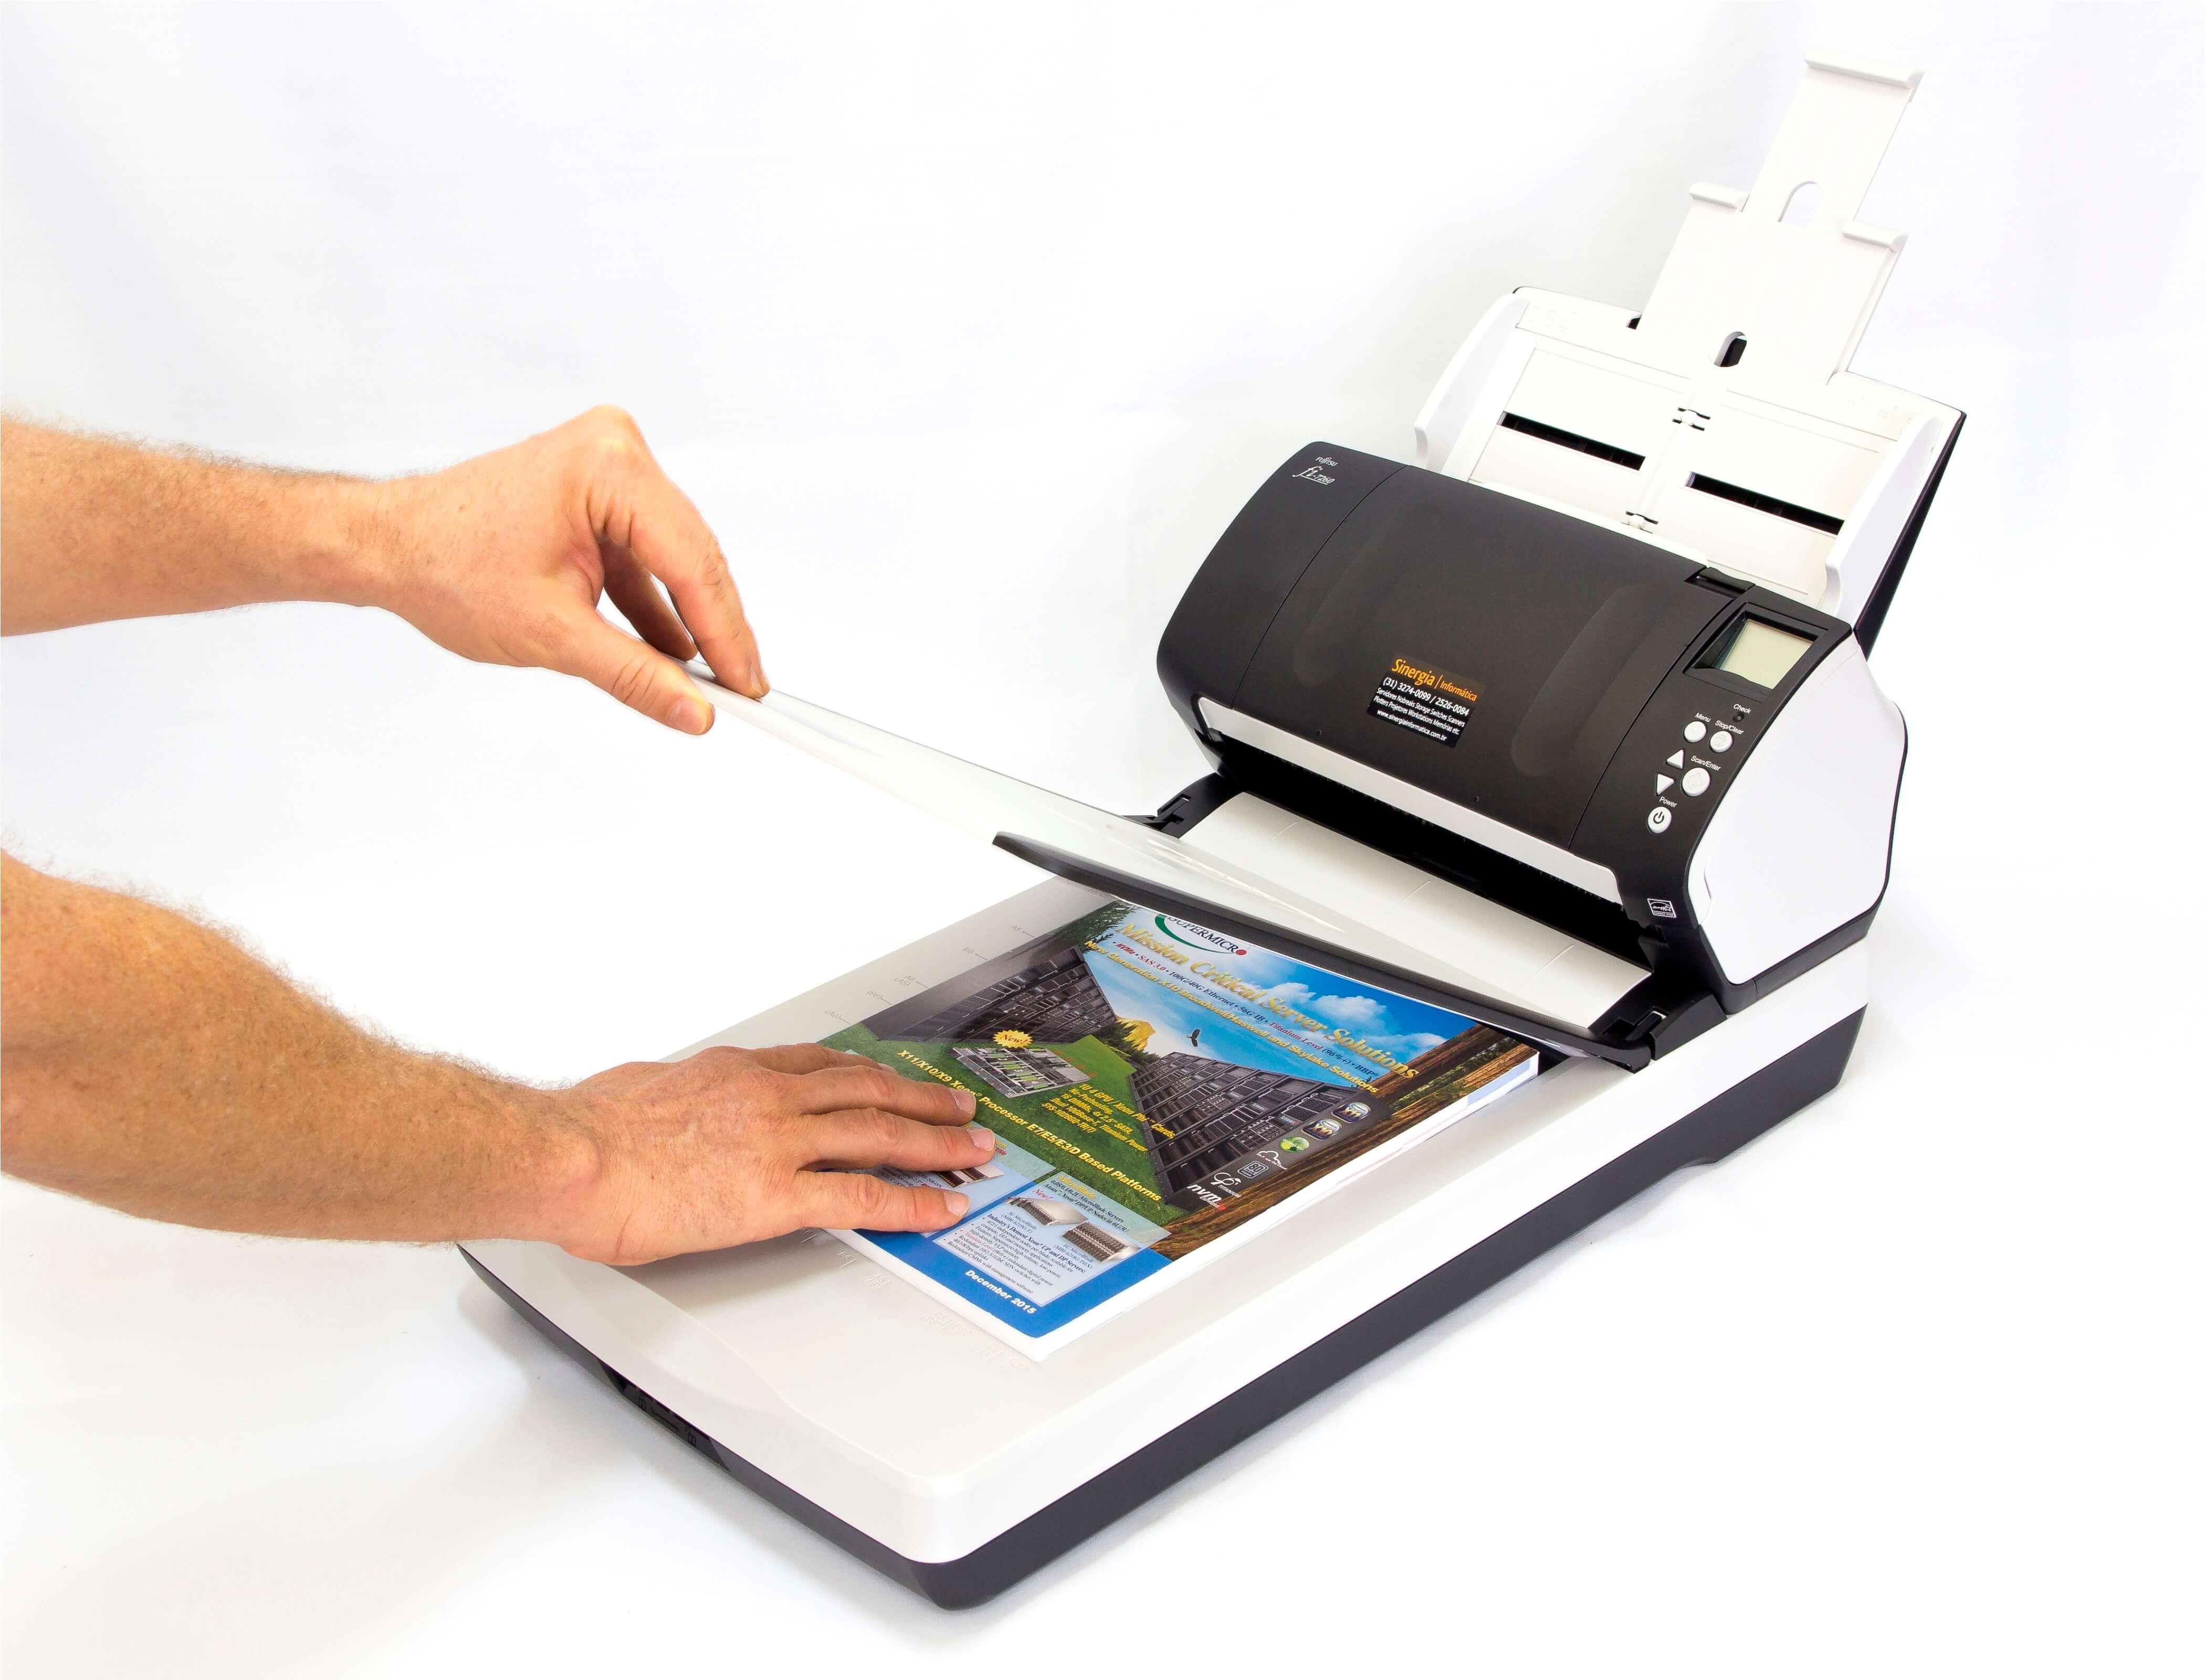 fi-7260 Scanner Fujitsu foto com uso do Flatbed